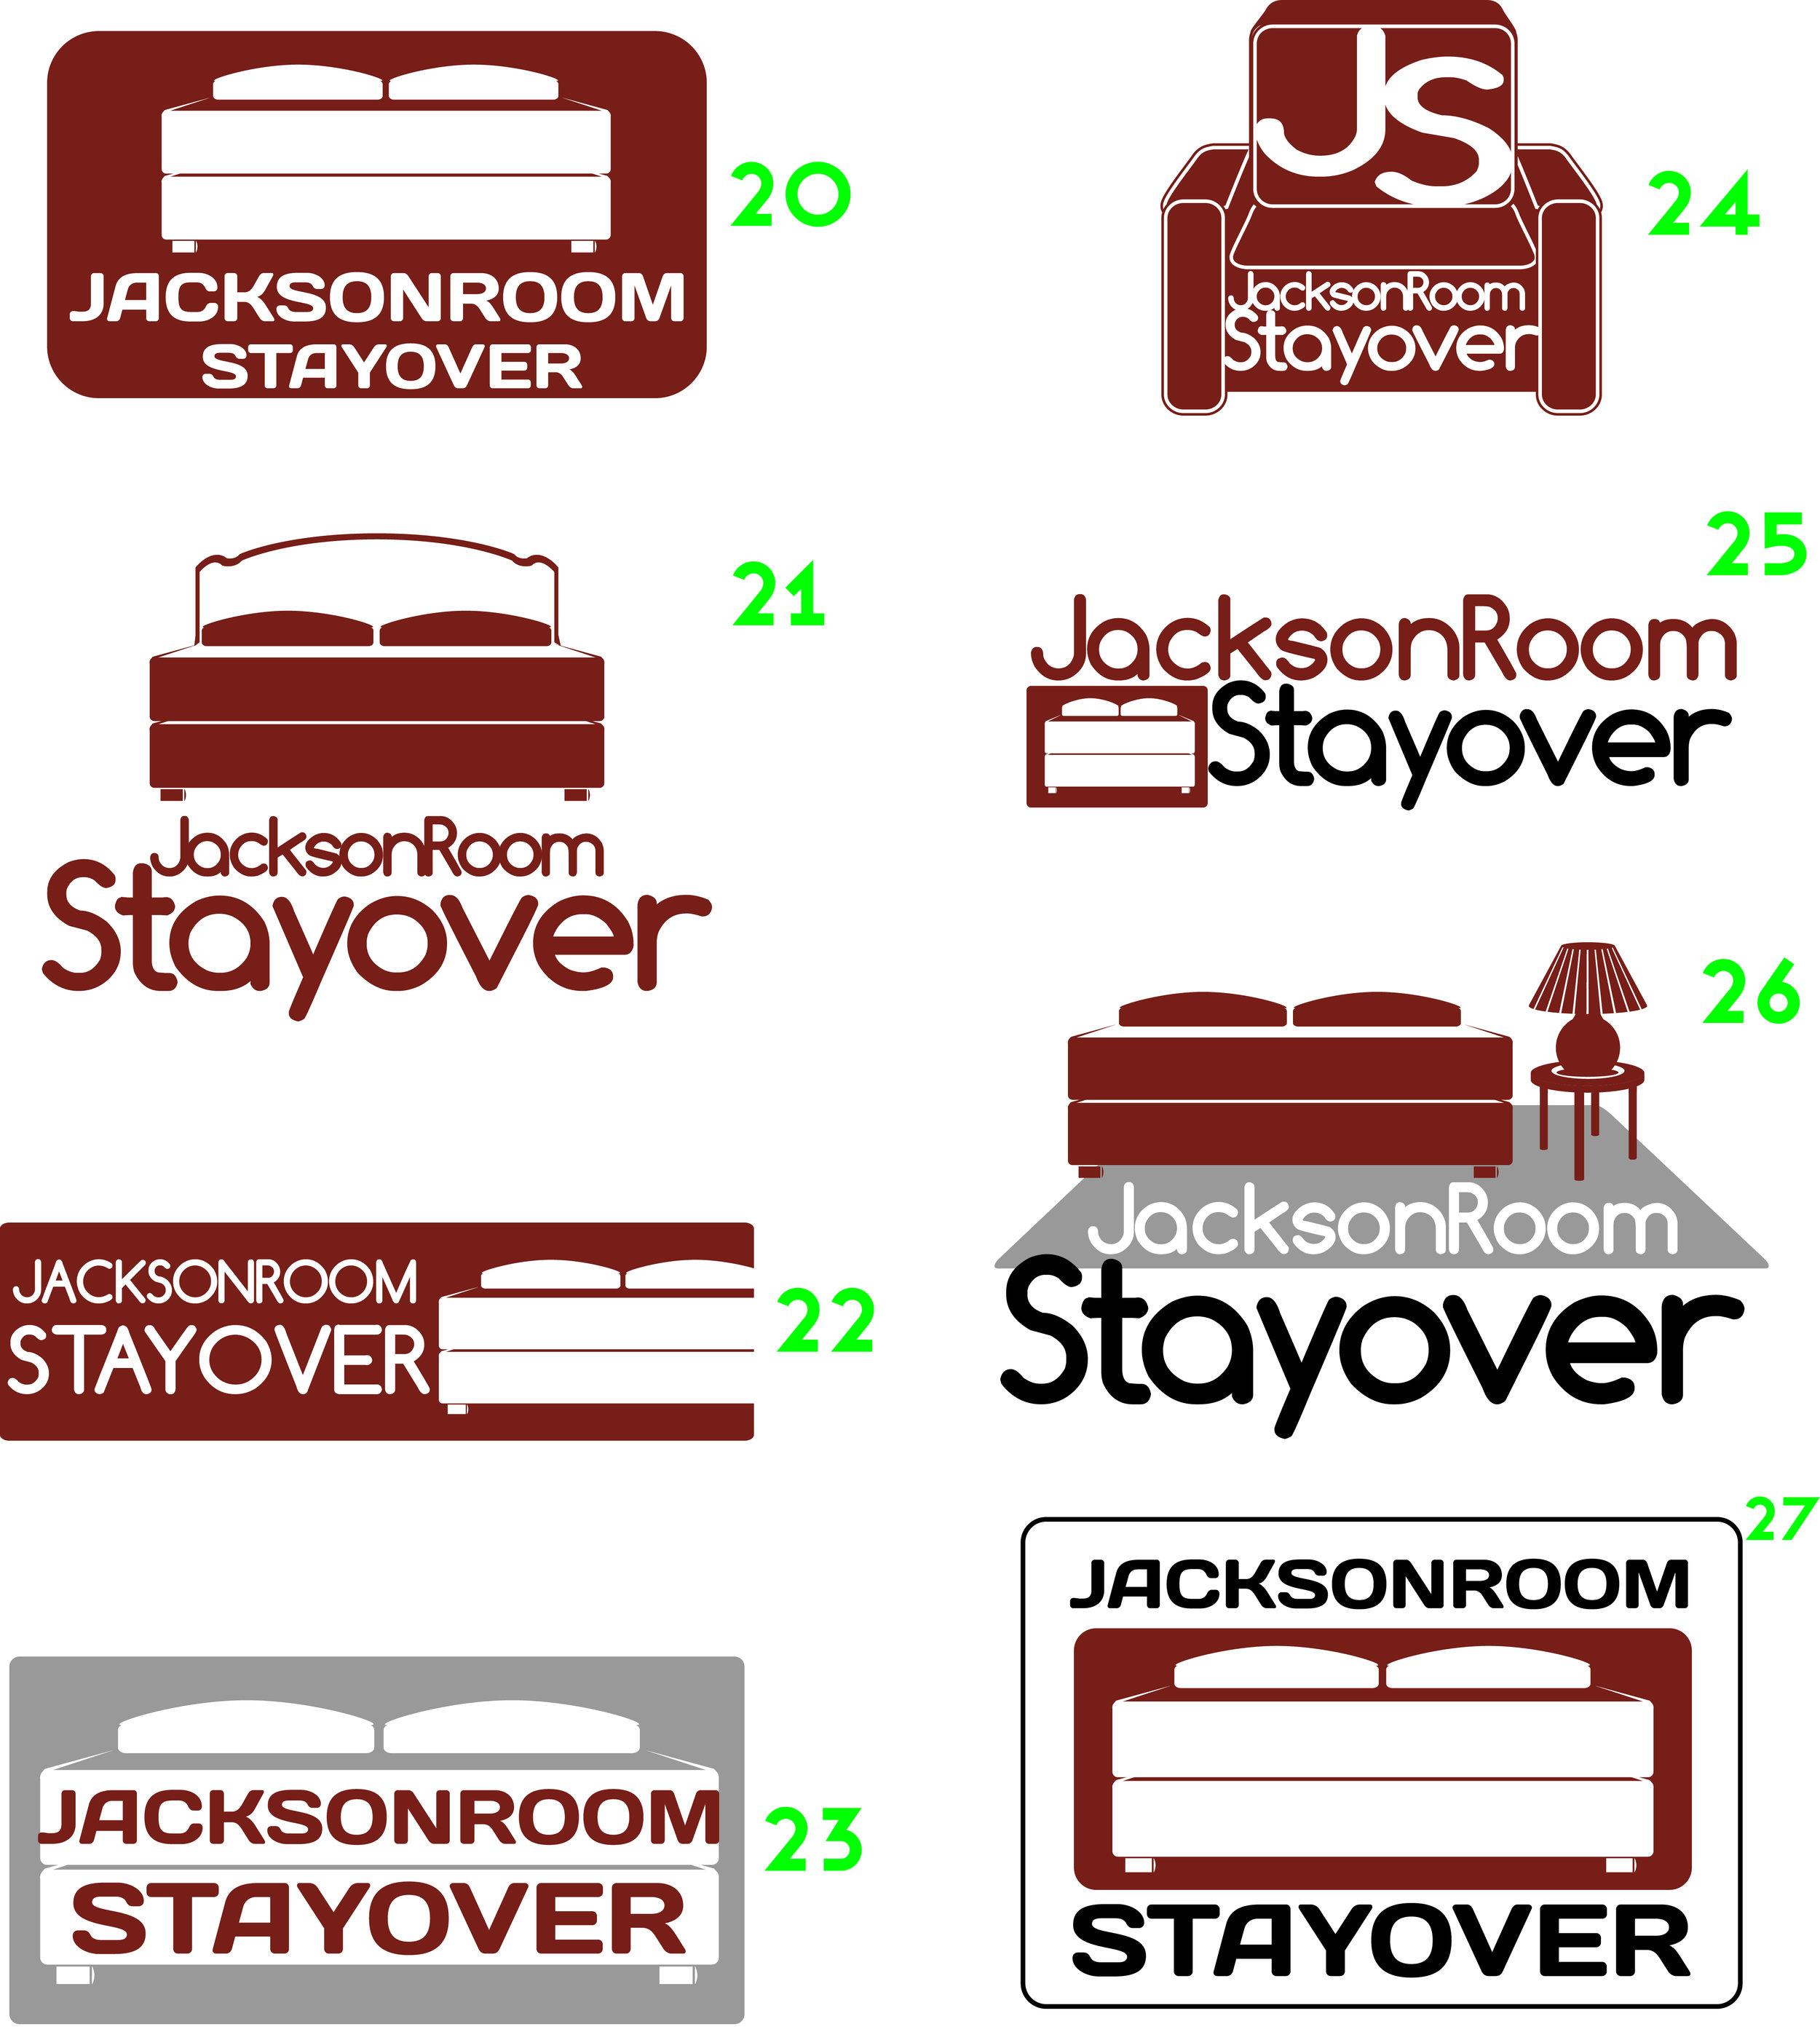 JacksonRoom Stayover logo4.jpg